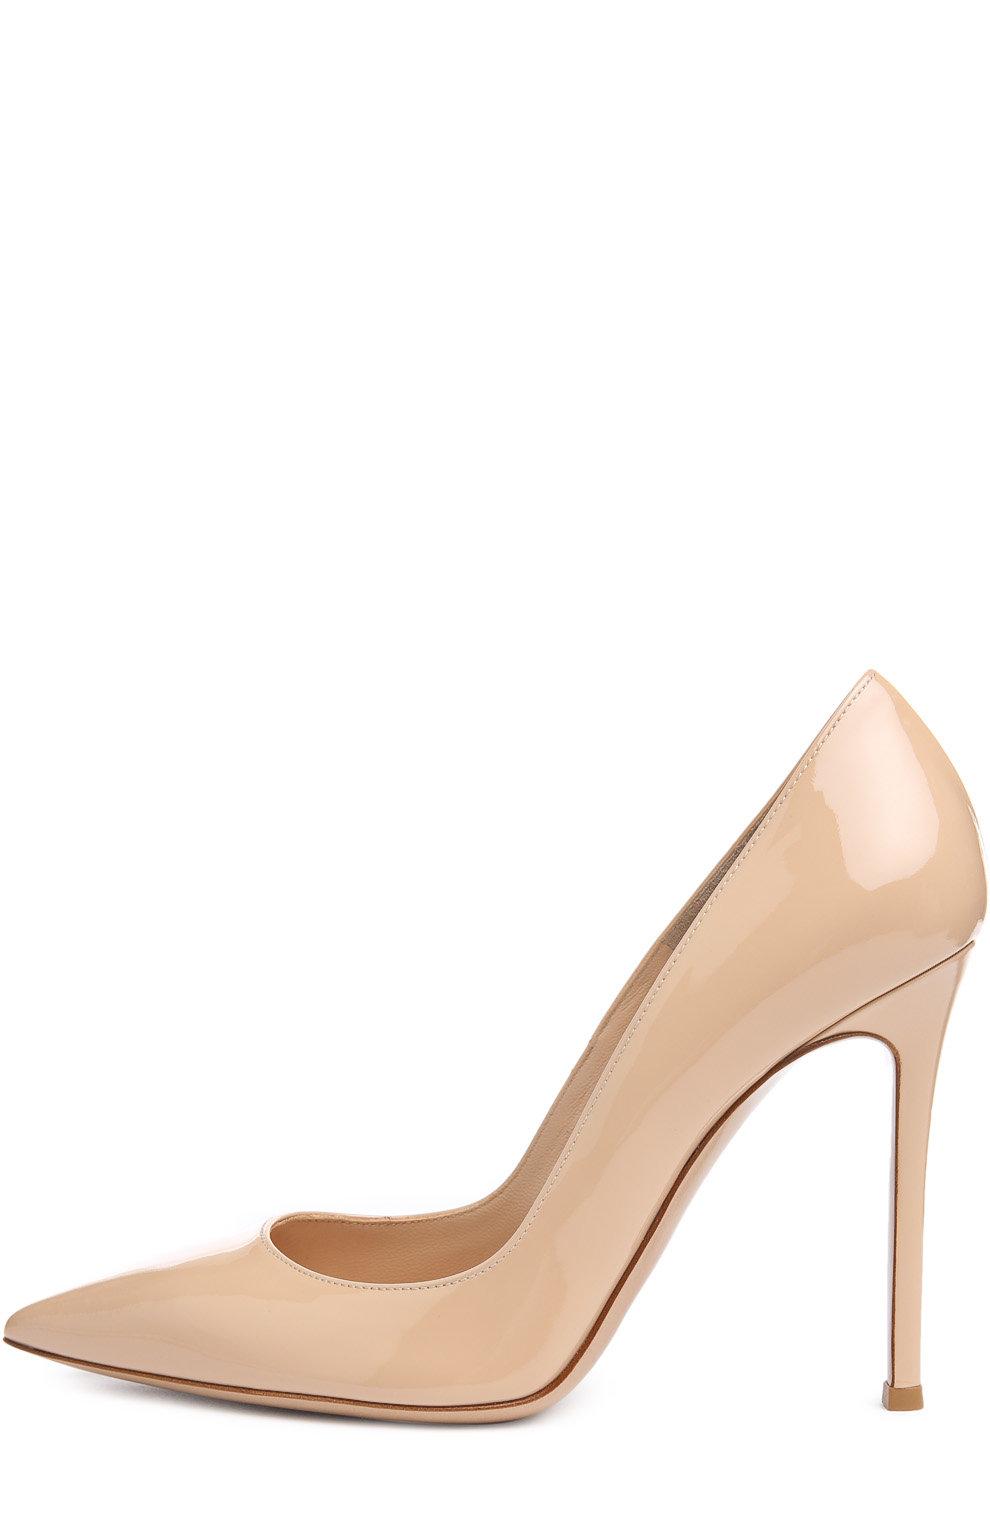 Туфли Gianvito Rossi арт. 4264130 в интернет-магазине ЦУМ